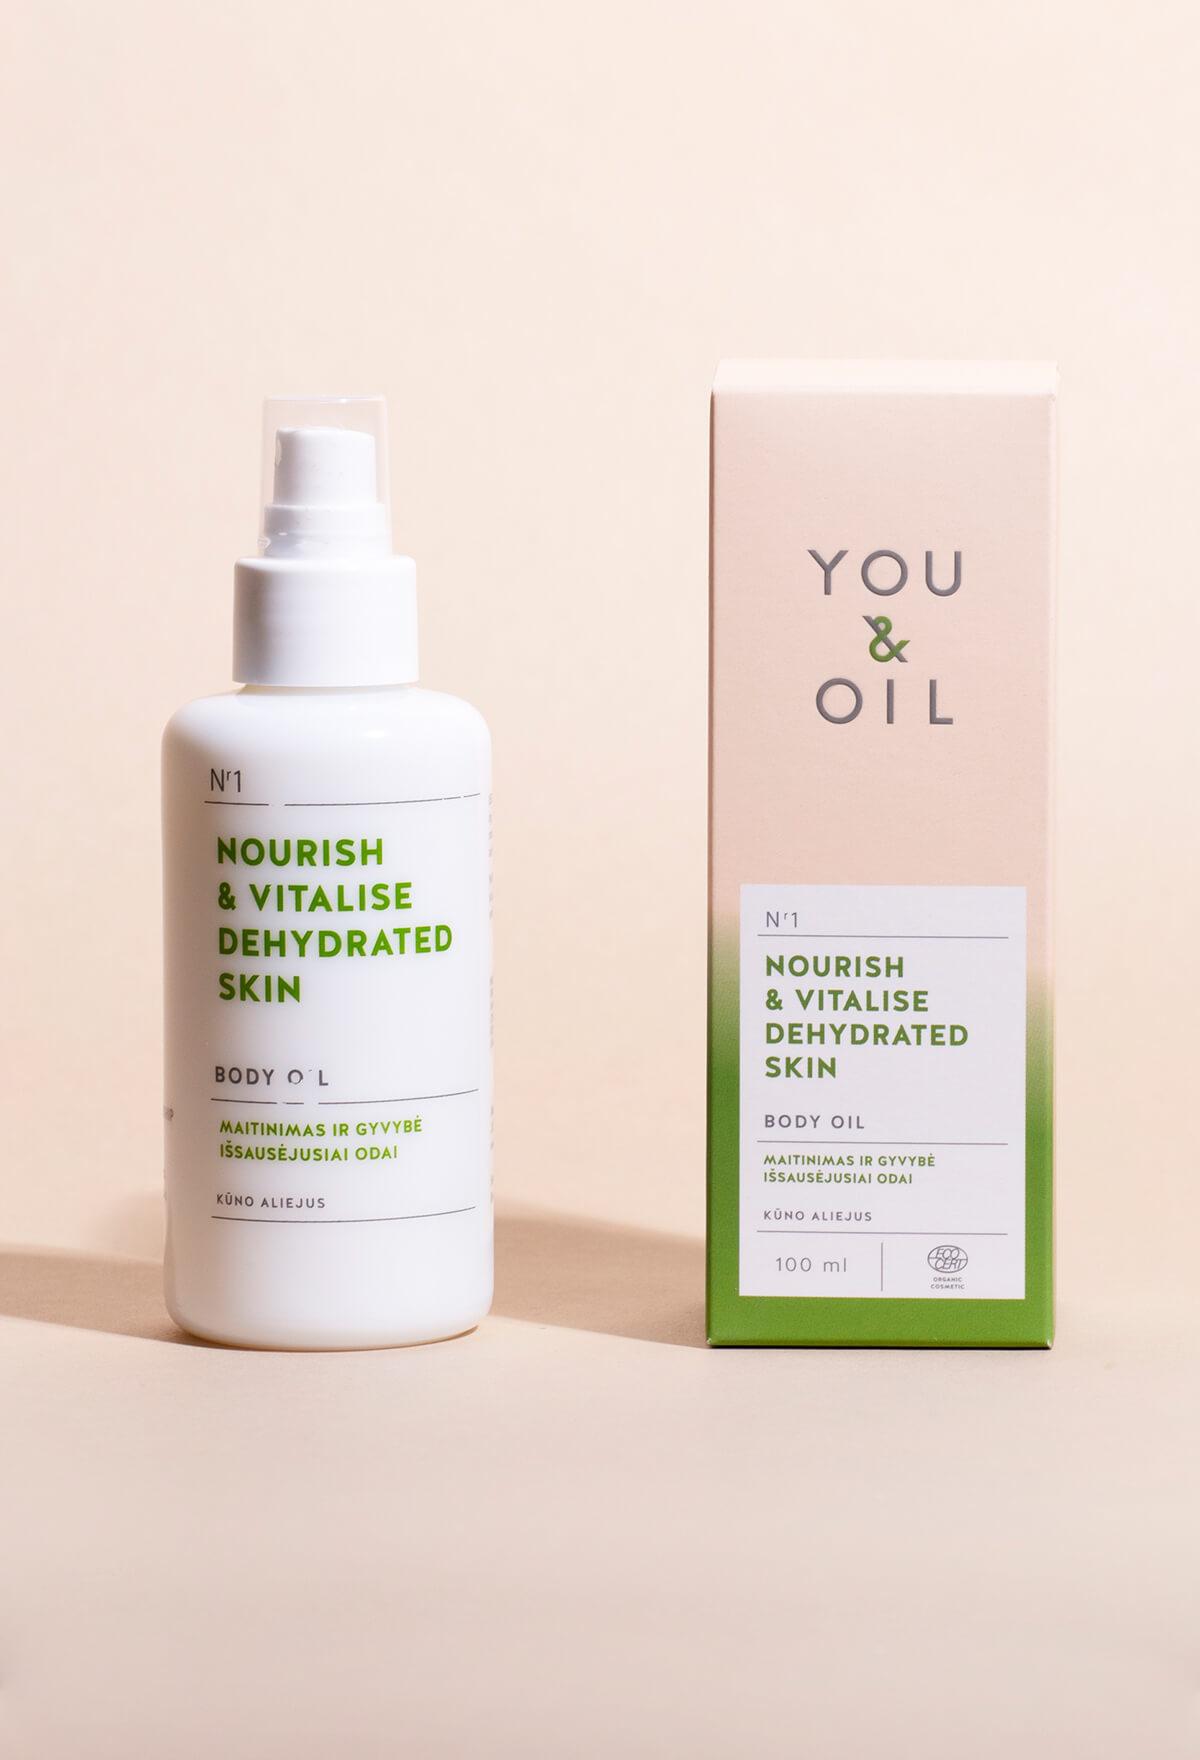 1301Nourish & Vitalise Dehydrated Skin